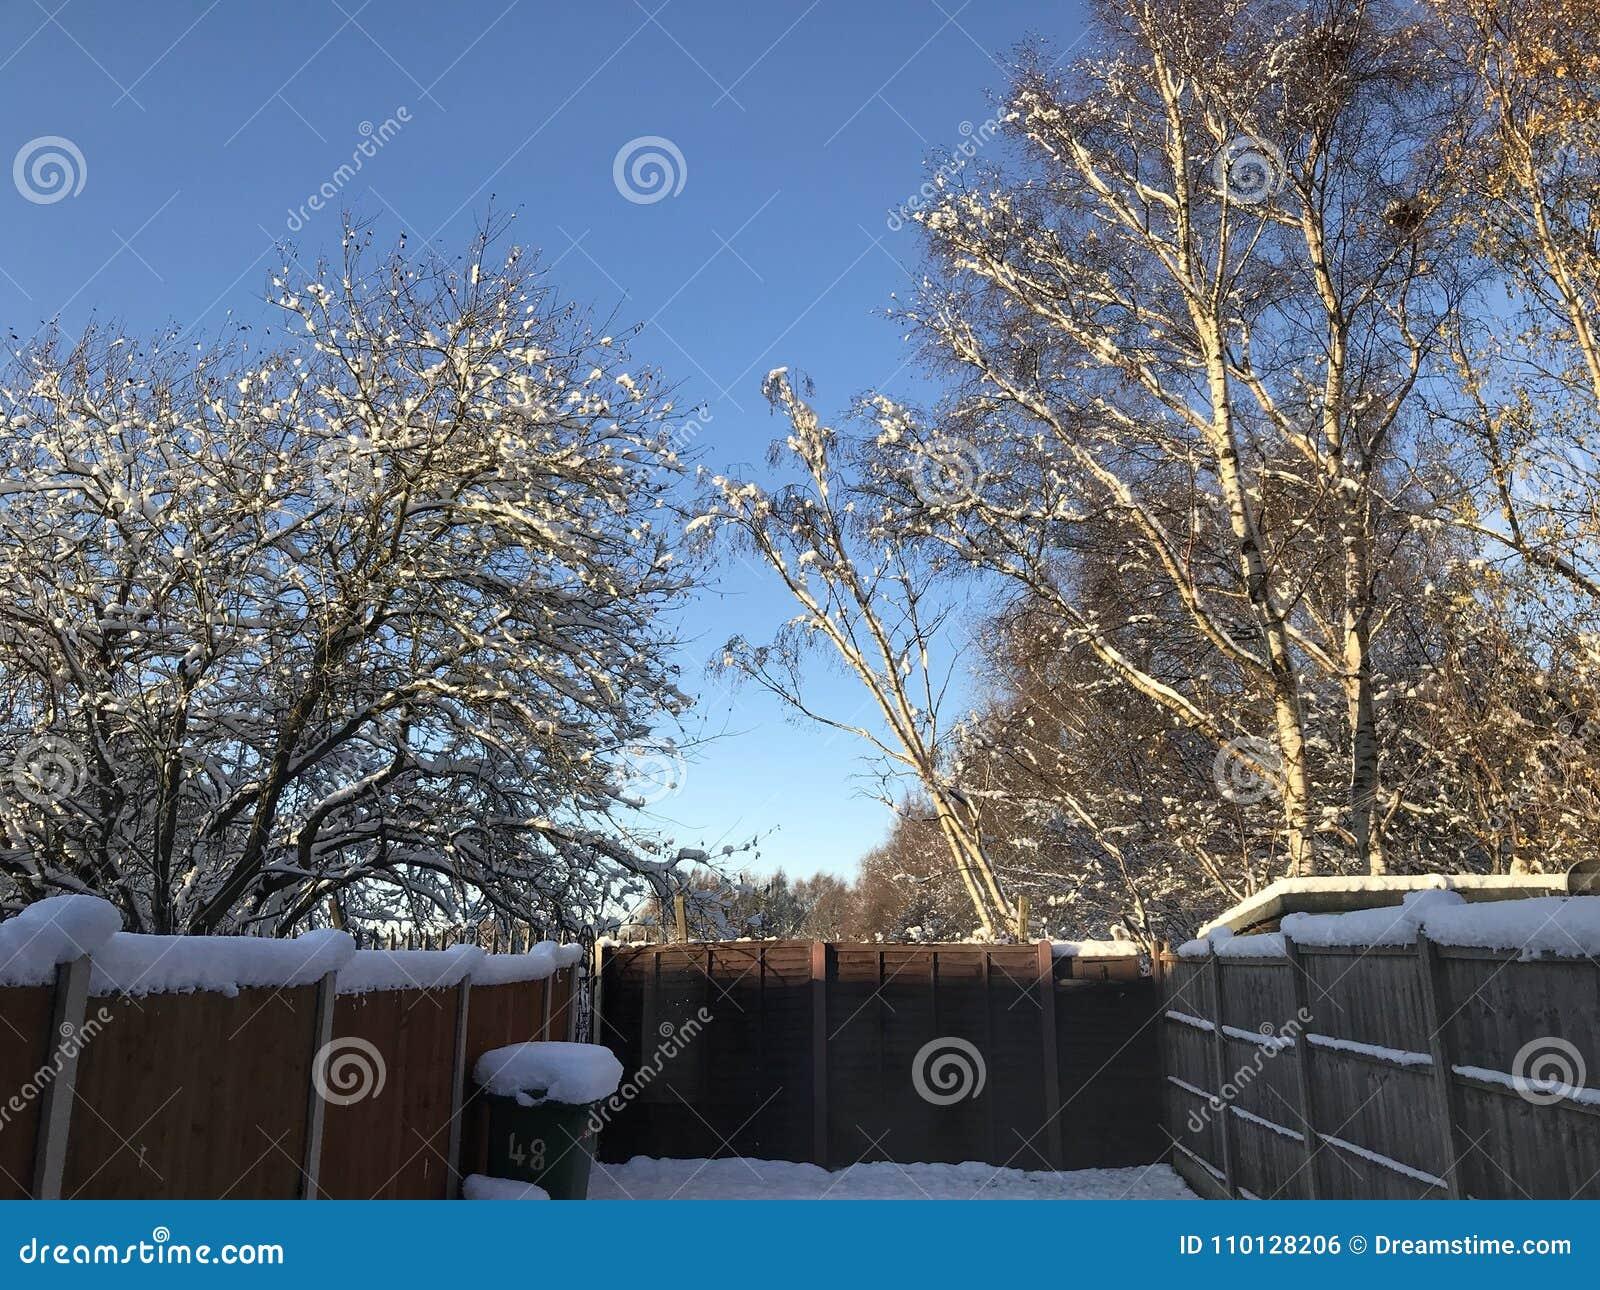 England Christmas Snow.Winter Wonderland At Christmas Stock Photo Image Of Winter